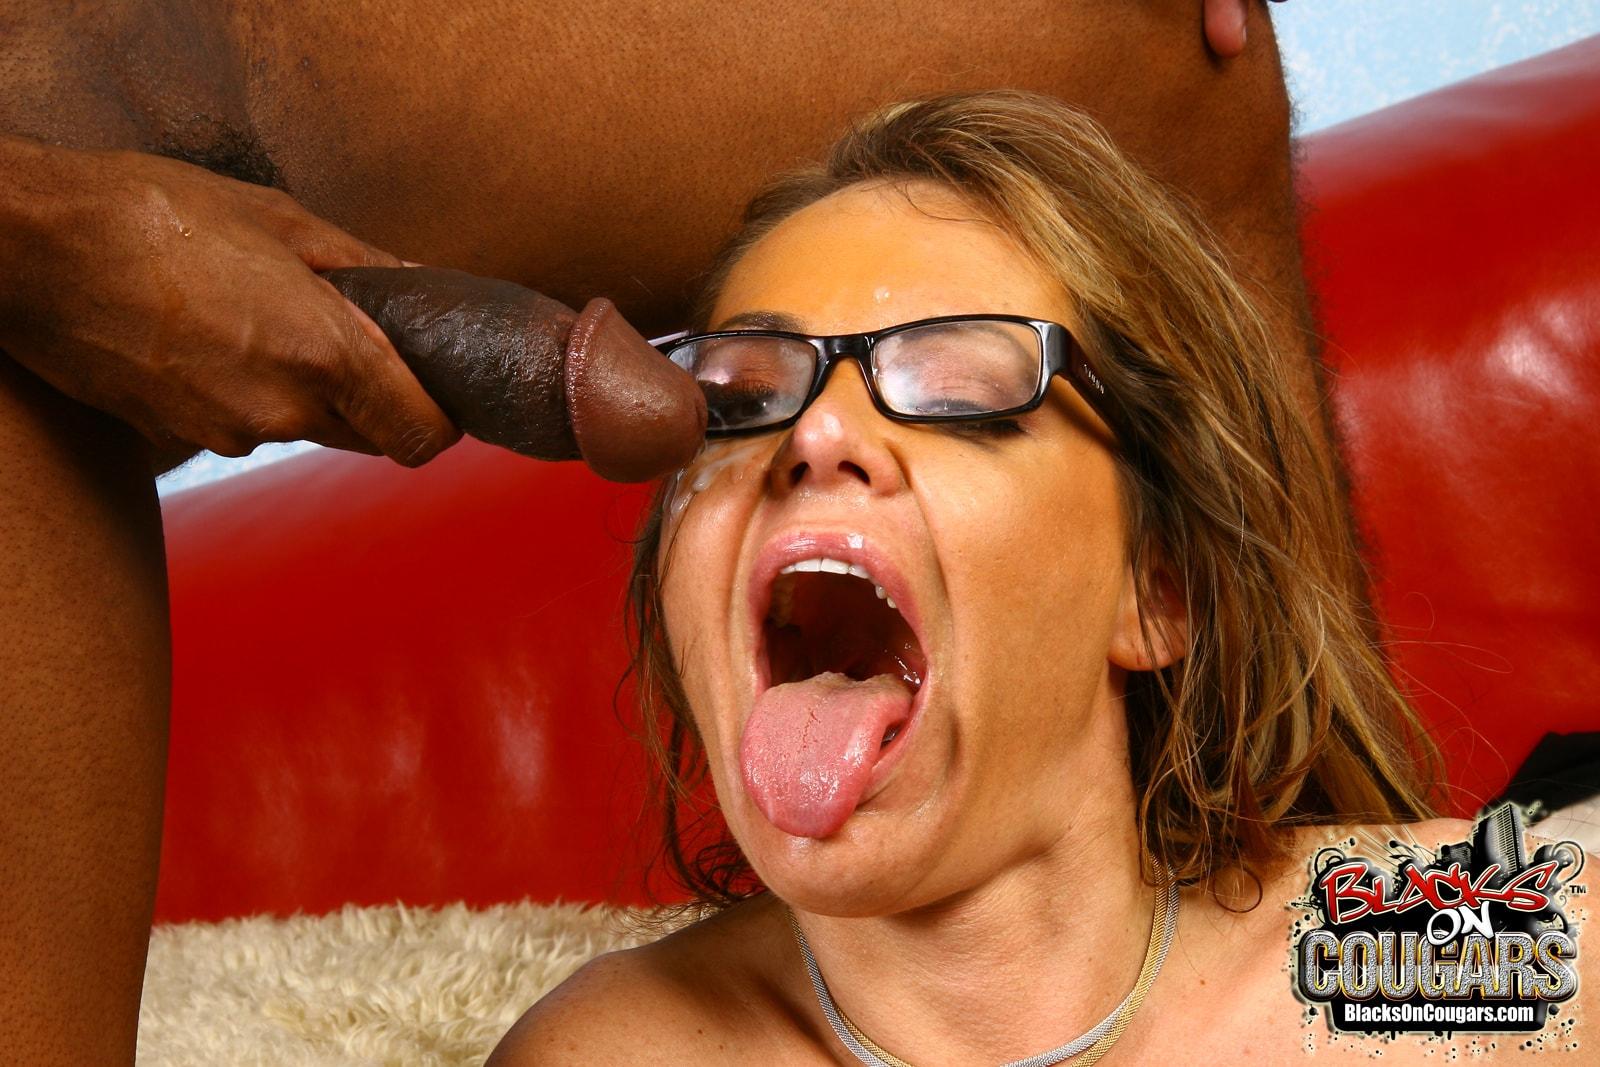 Dogfart '- Blacks On Cougars' starring Kelly Leigh (Photo 29)